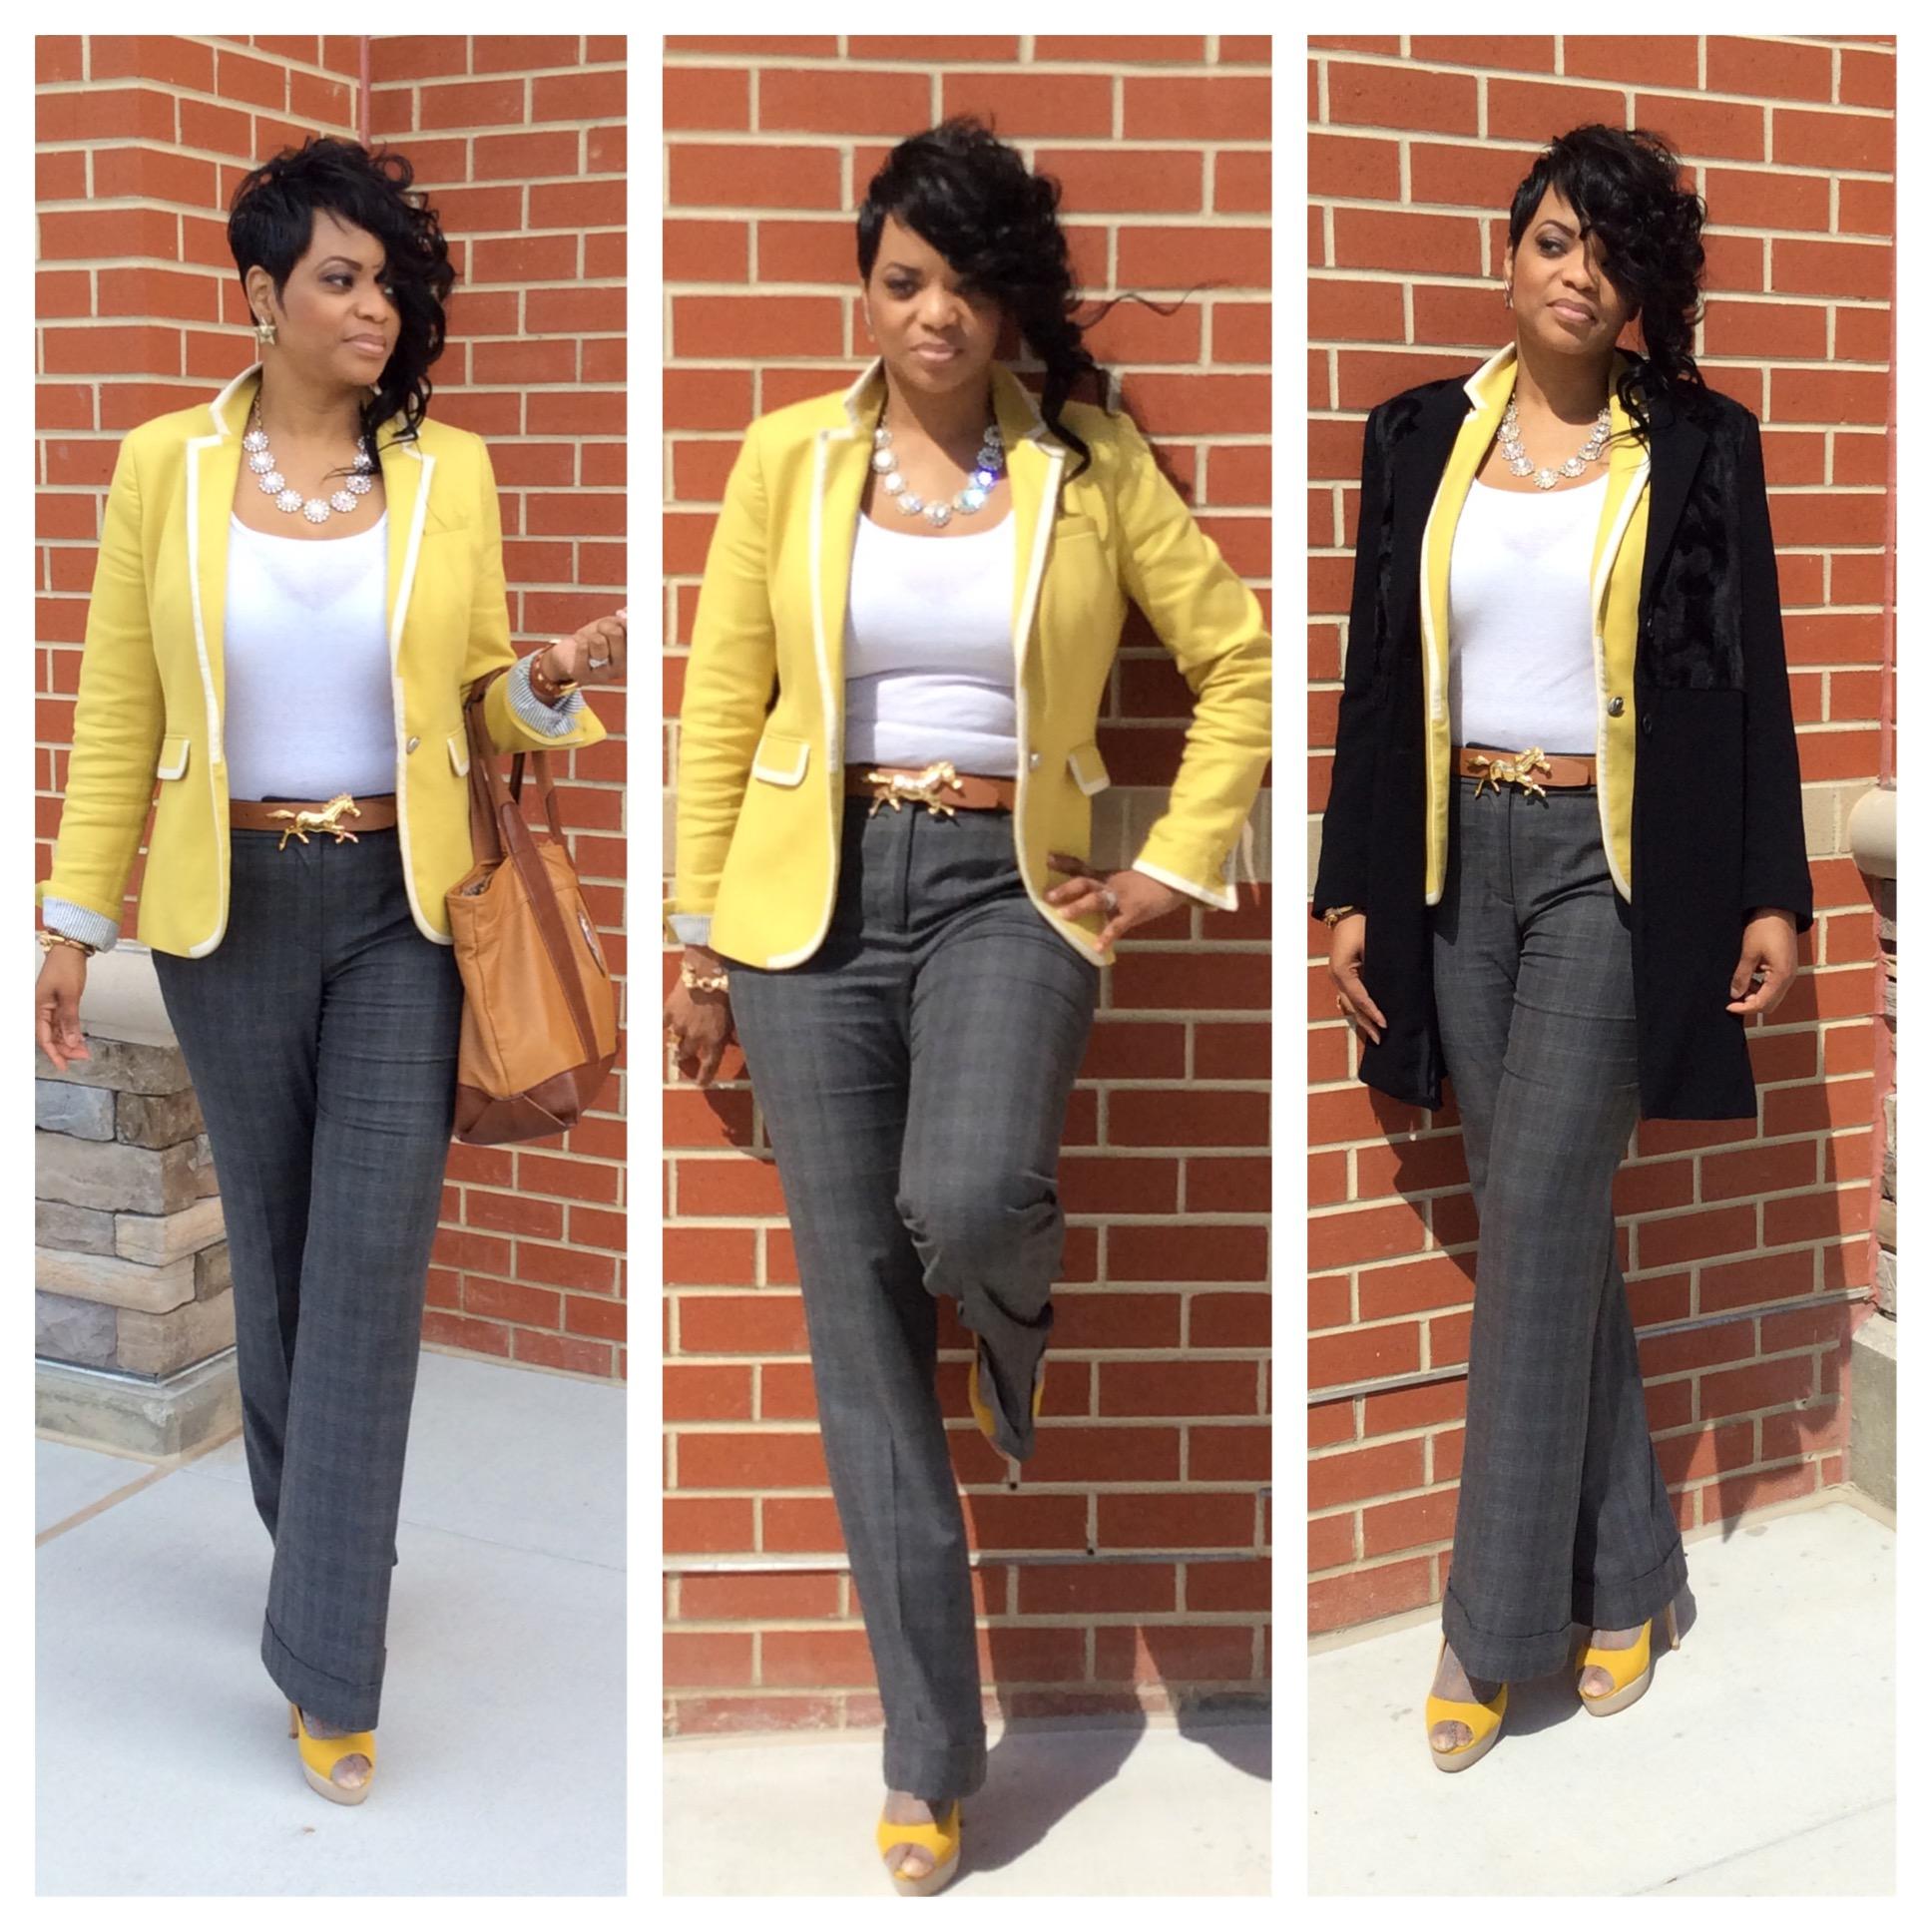 My #WardrobeHustle Blazer:  Banana Republic  Trousers:  LOFT  Shoes:  Aldo  Purse: Tory BurchCoat:  Vince Camuto  Sunnies:  Miu Miu